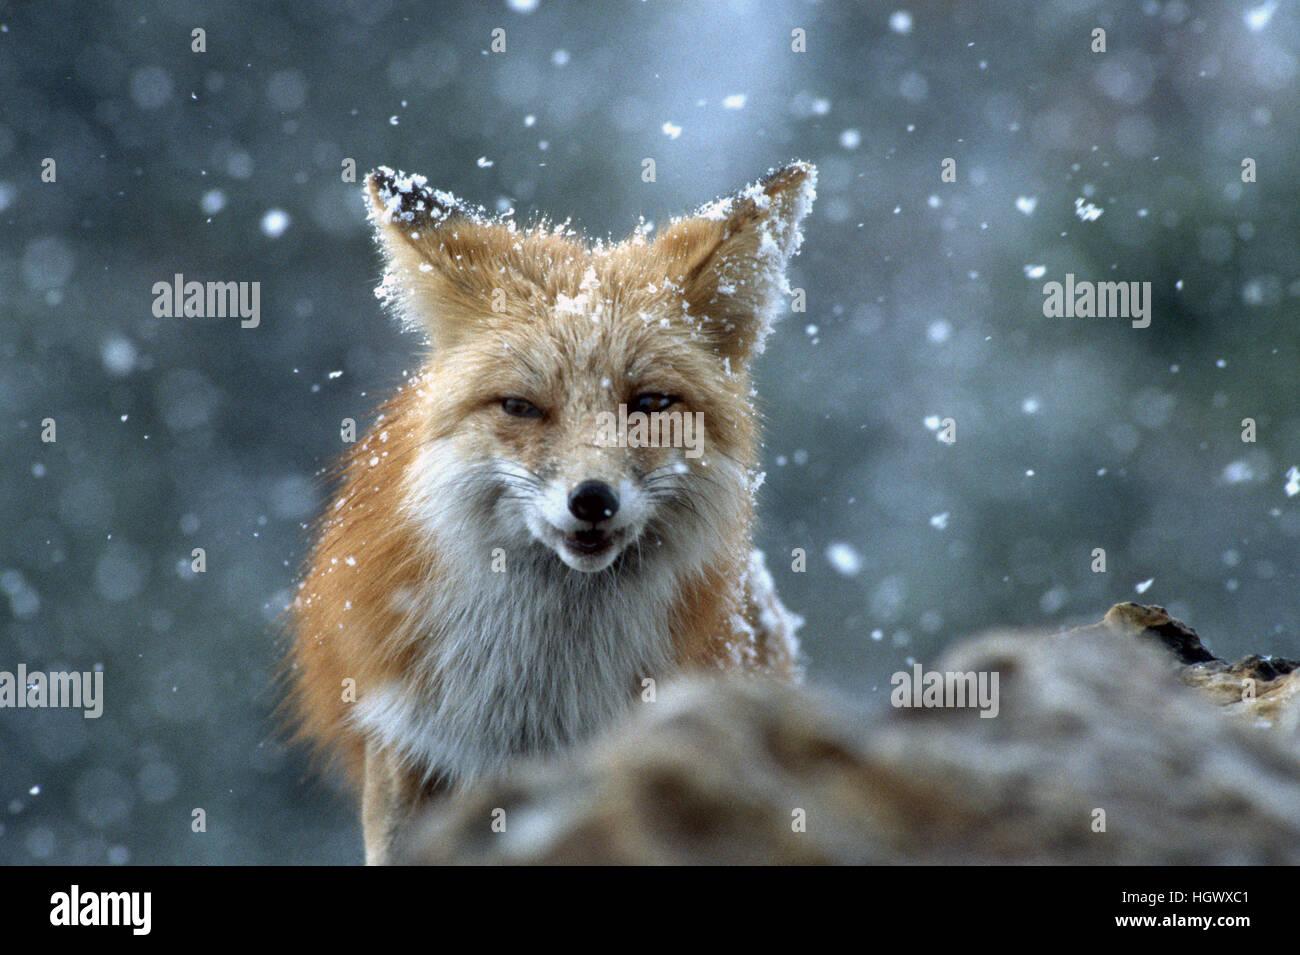 Fox con mirada amenazante Imagen De Stock